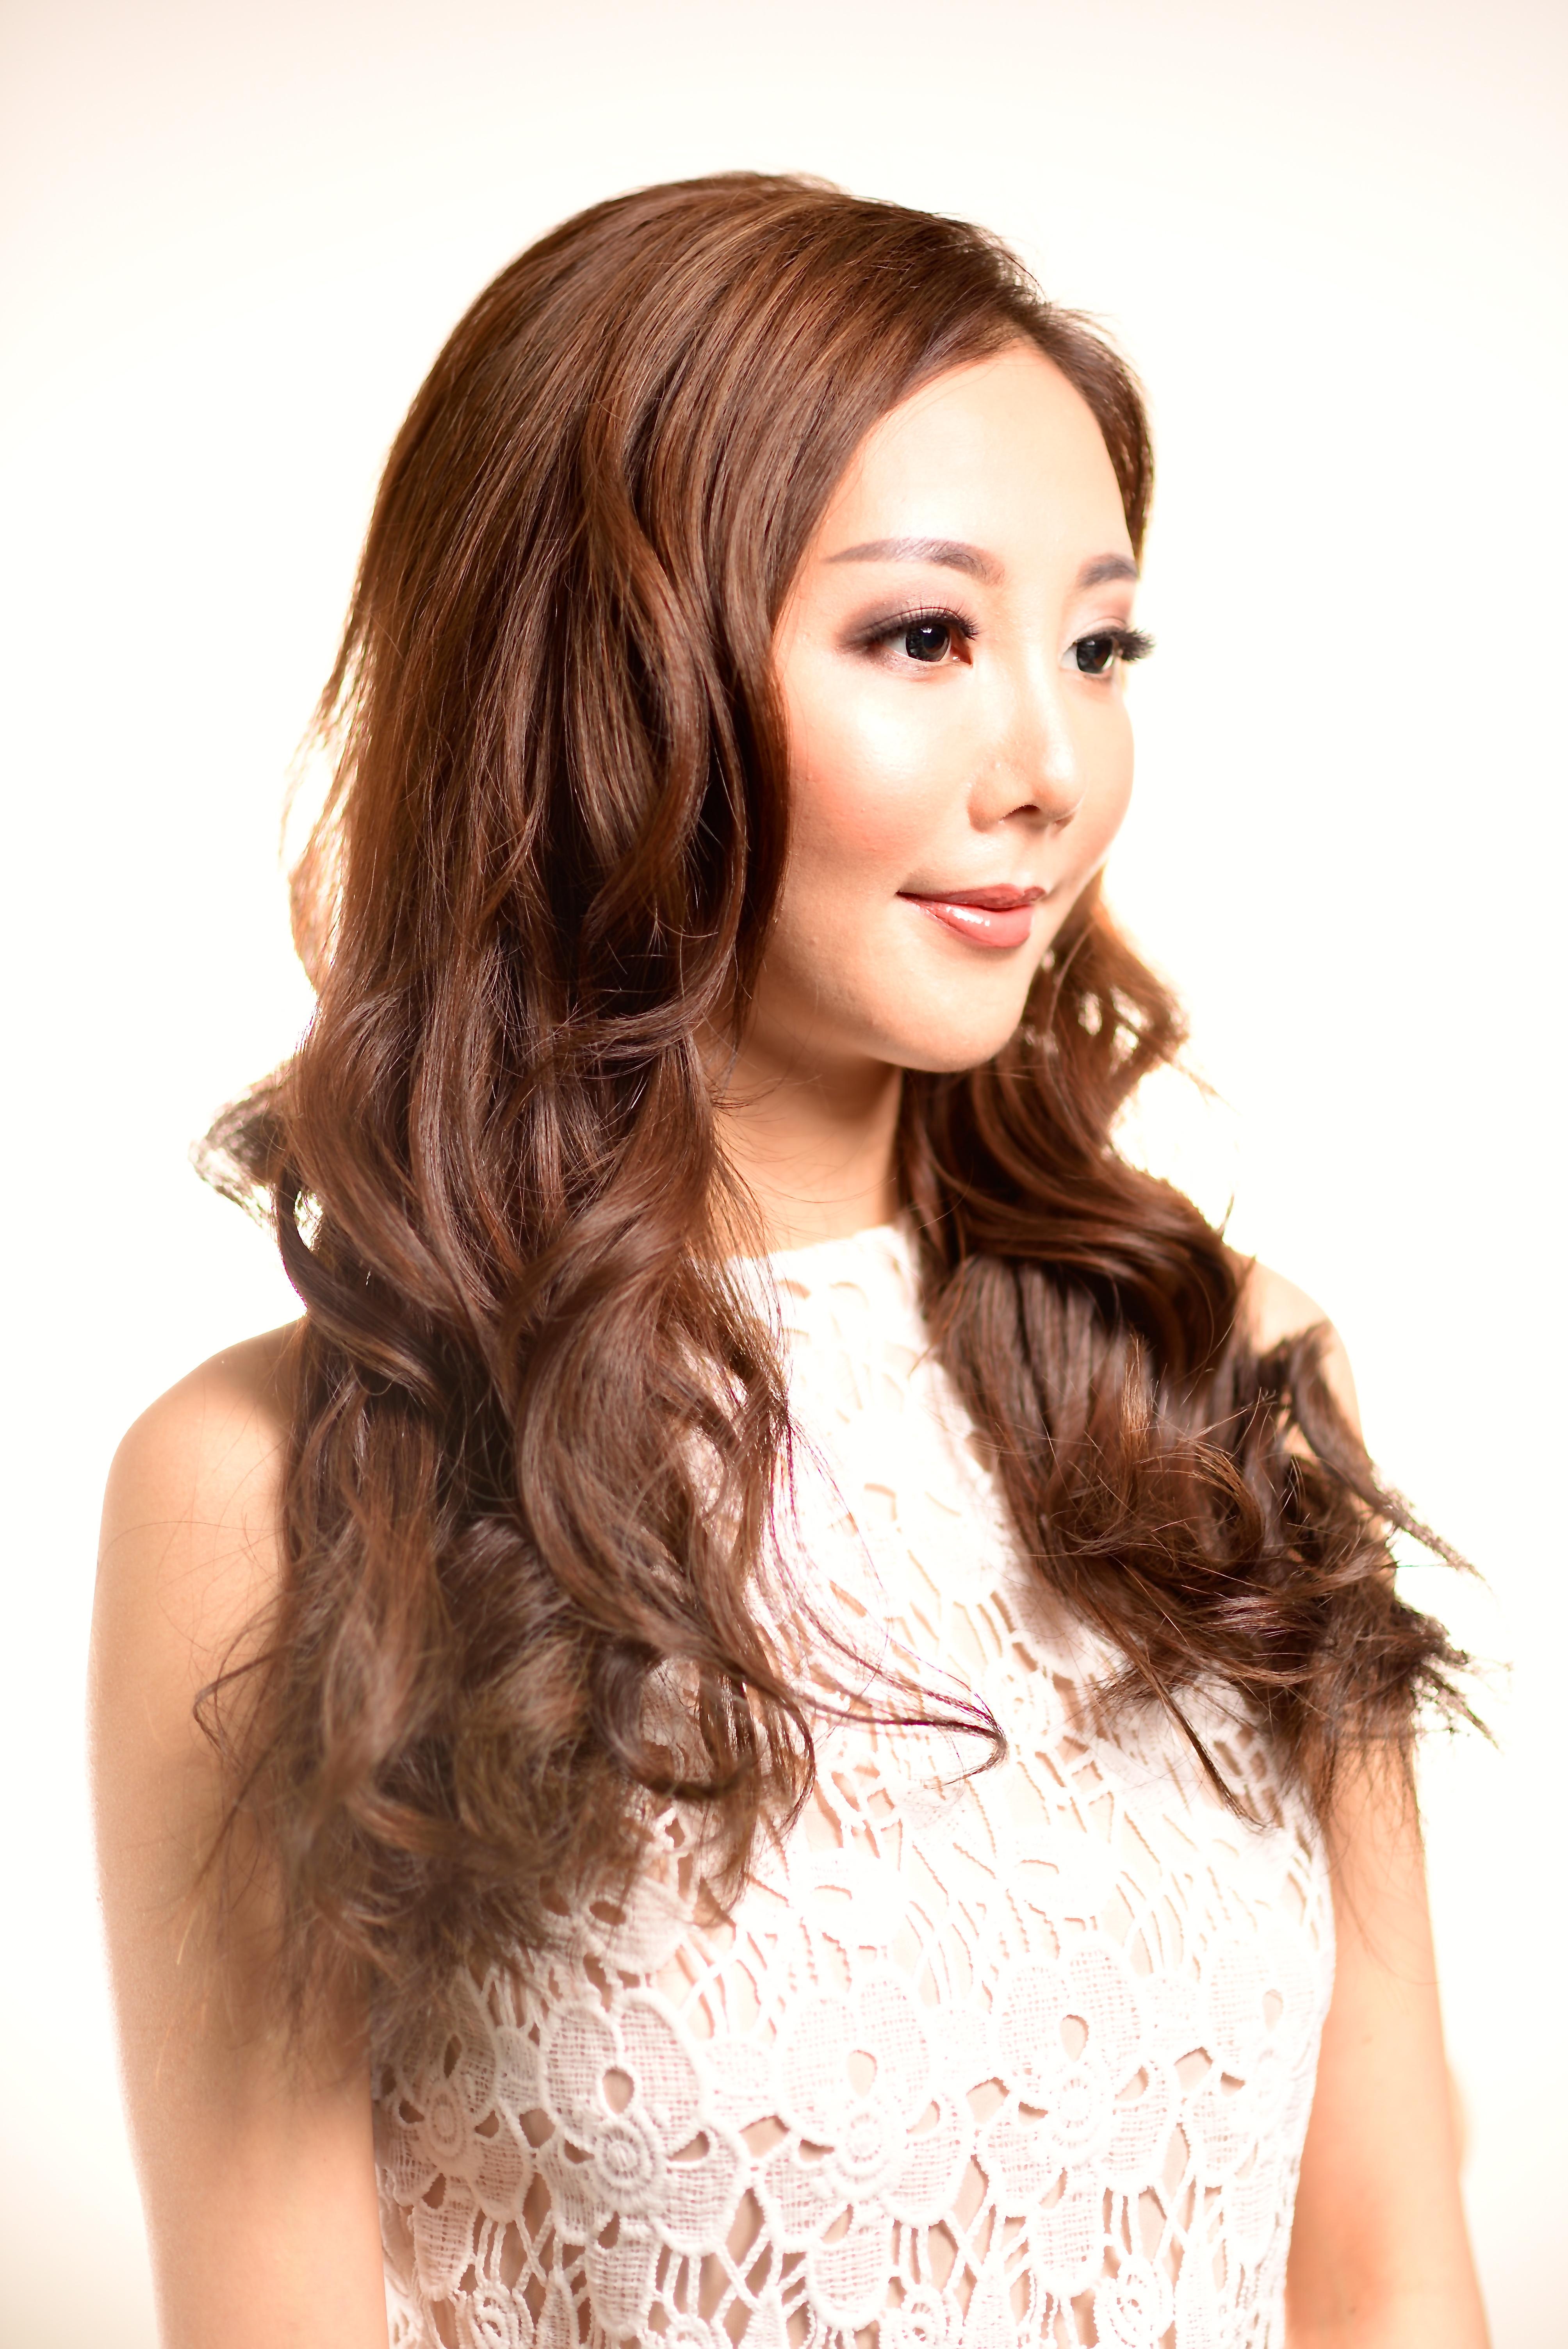 Fashion and Beauty Hair & MakeupPhoto credit: Eric Chen